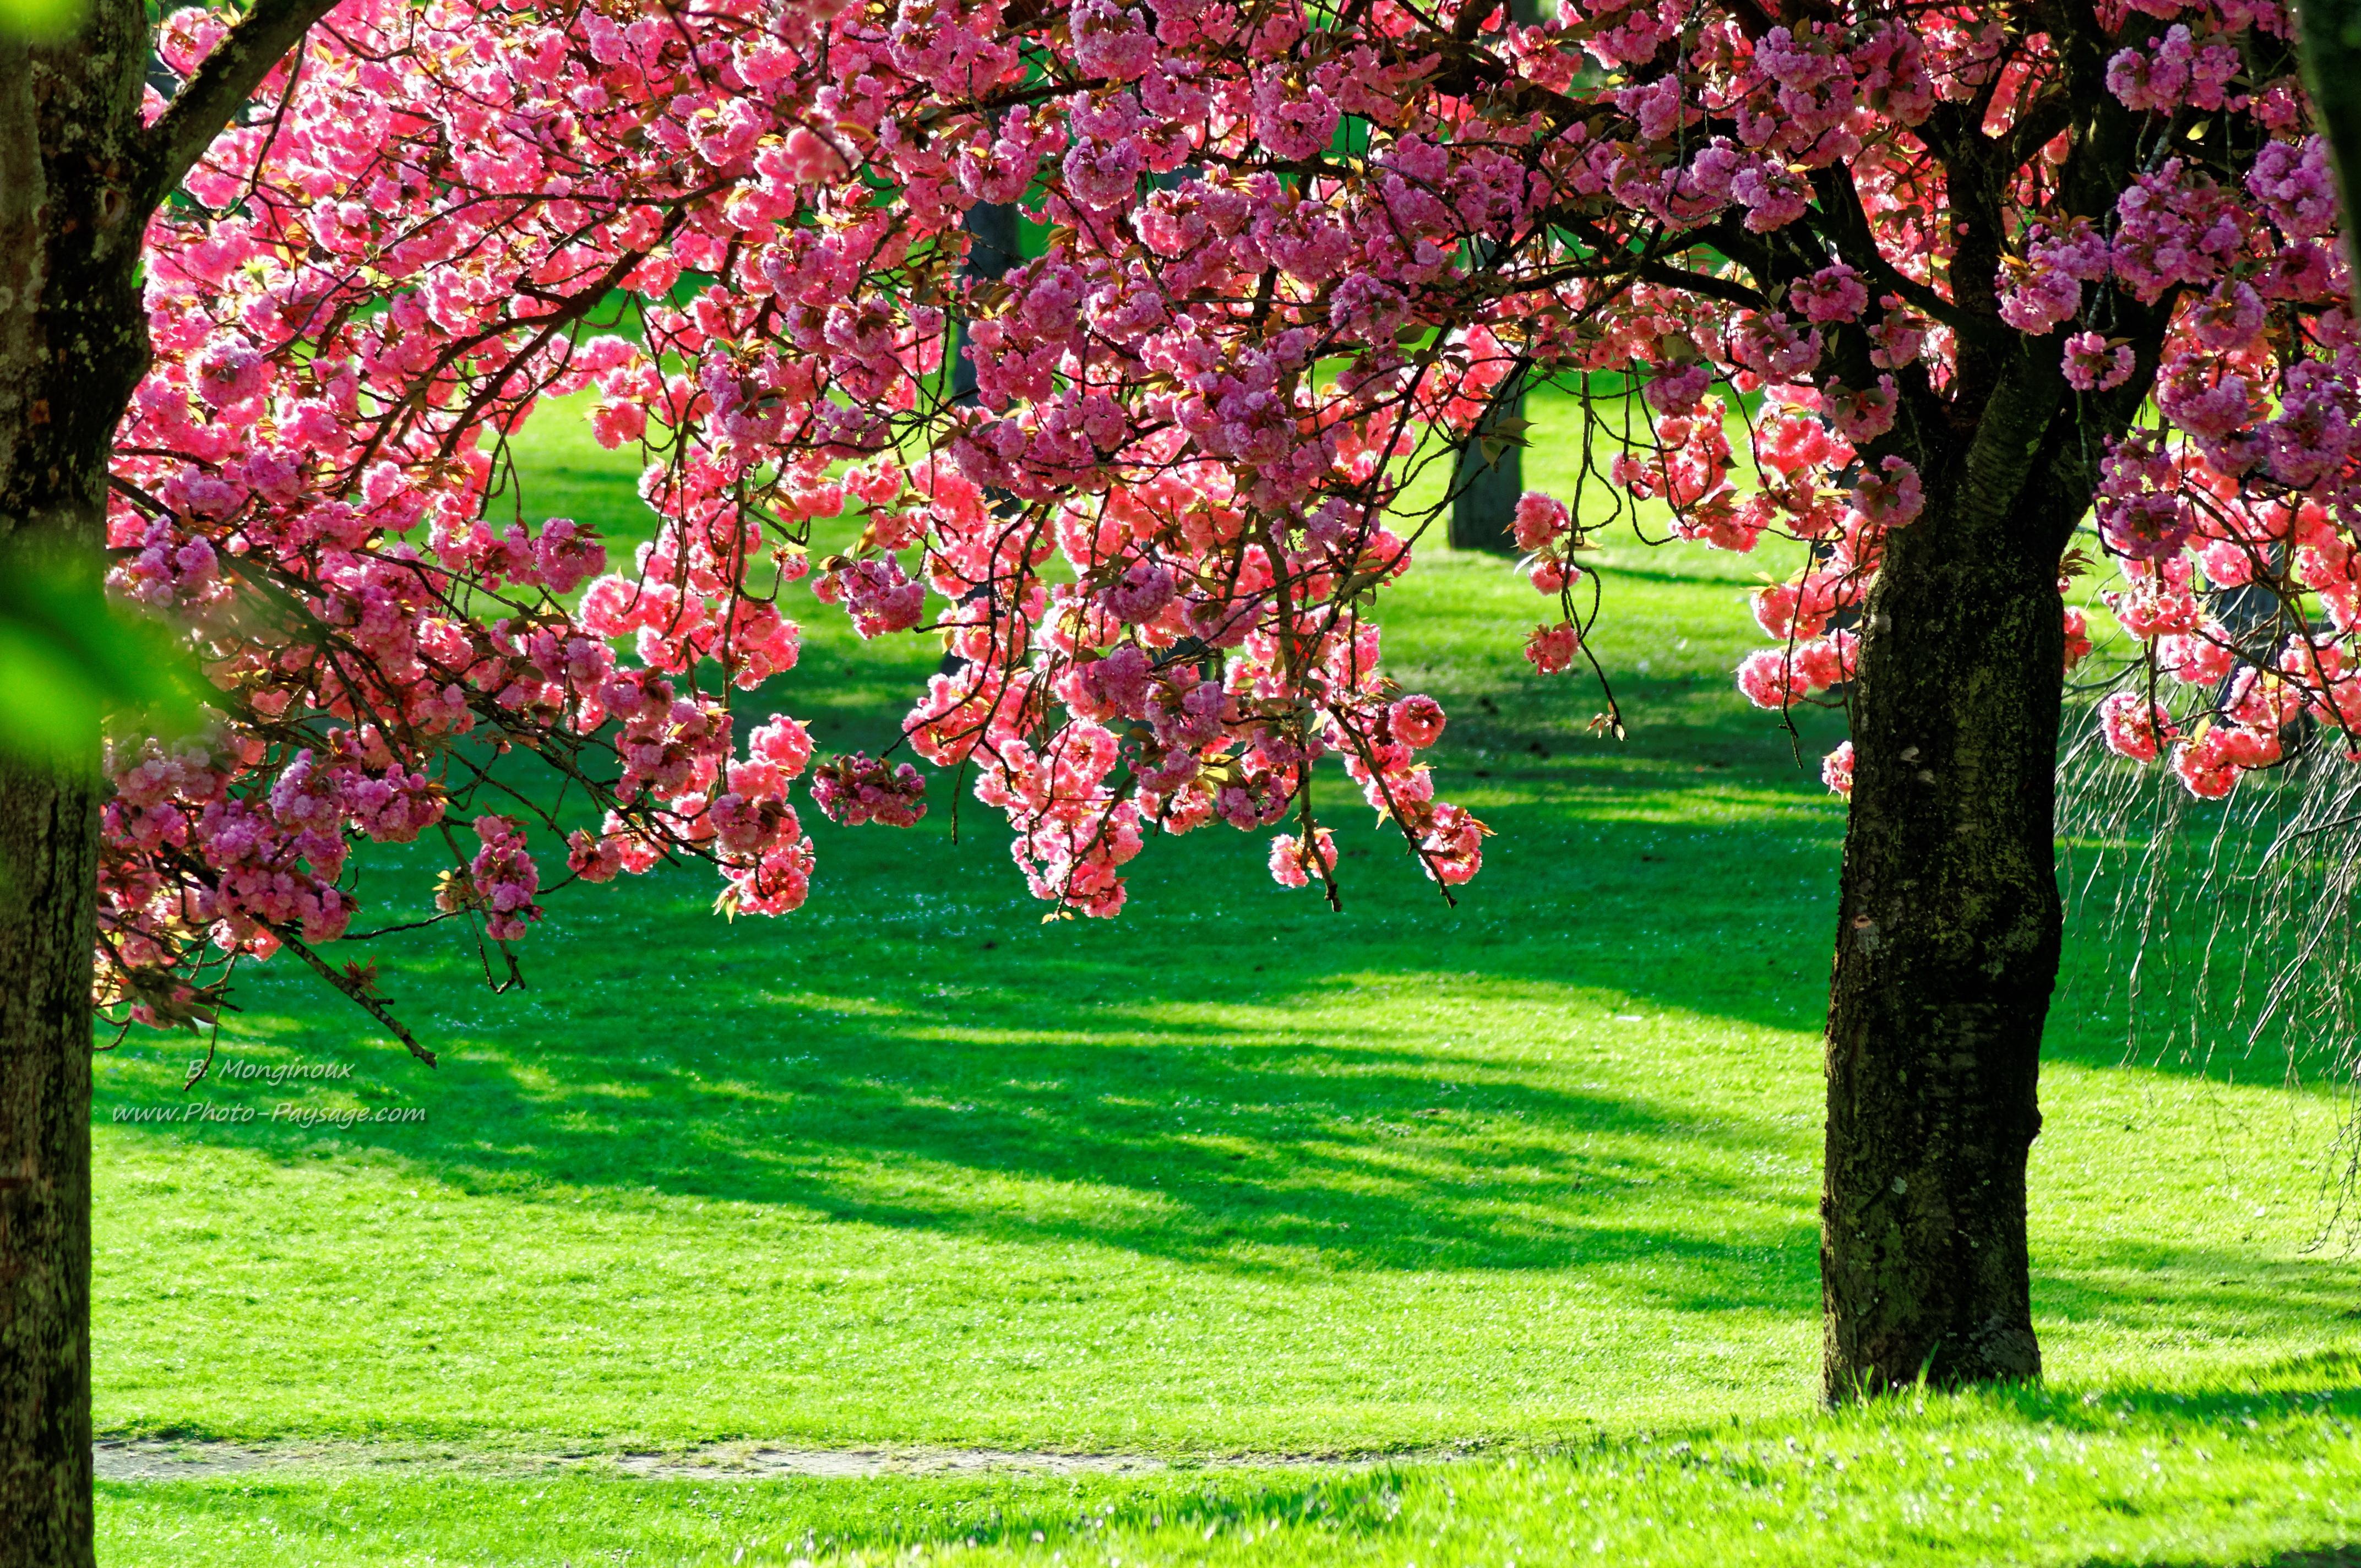 scenery spring pictures fleurs de printemps en fond d 39 ecran. Black Bedroom Furniture Sets. Home Design Ideas